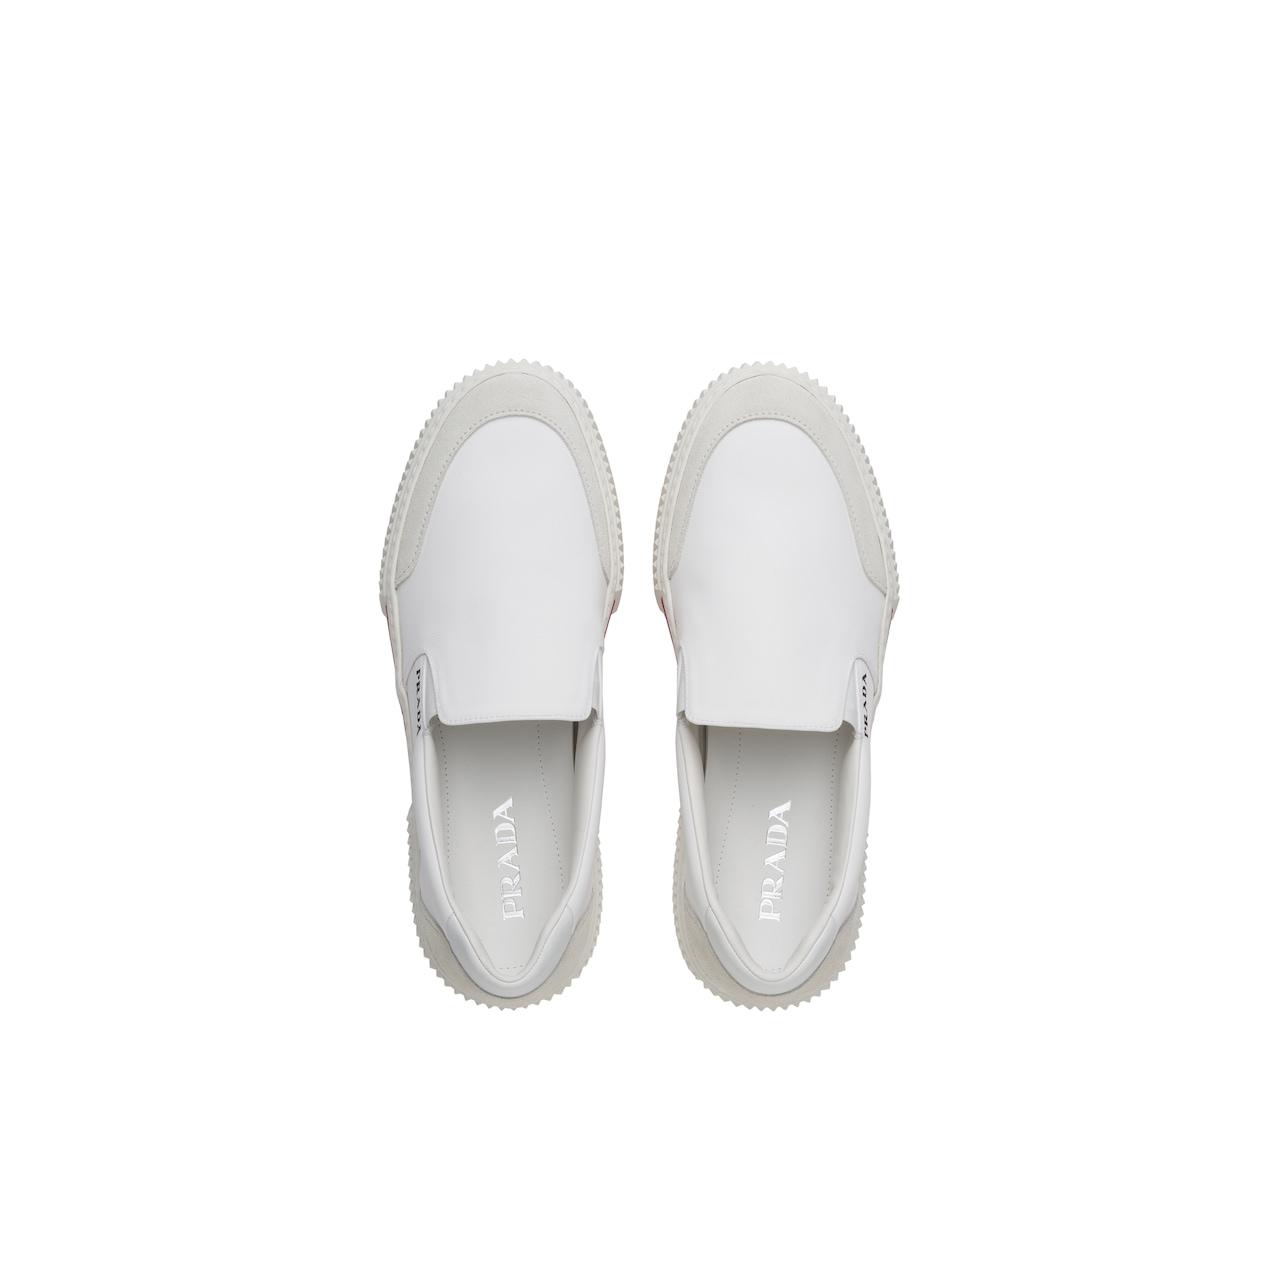 Prada 尼龙和麂皮运动鞋 4